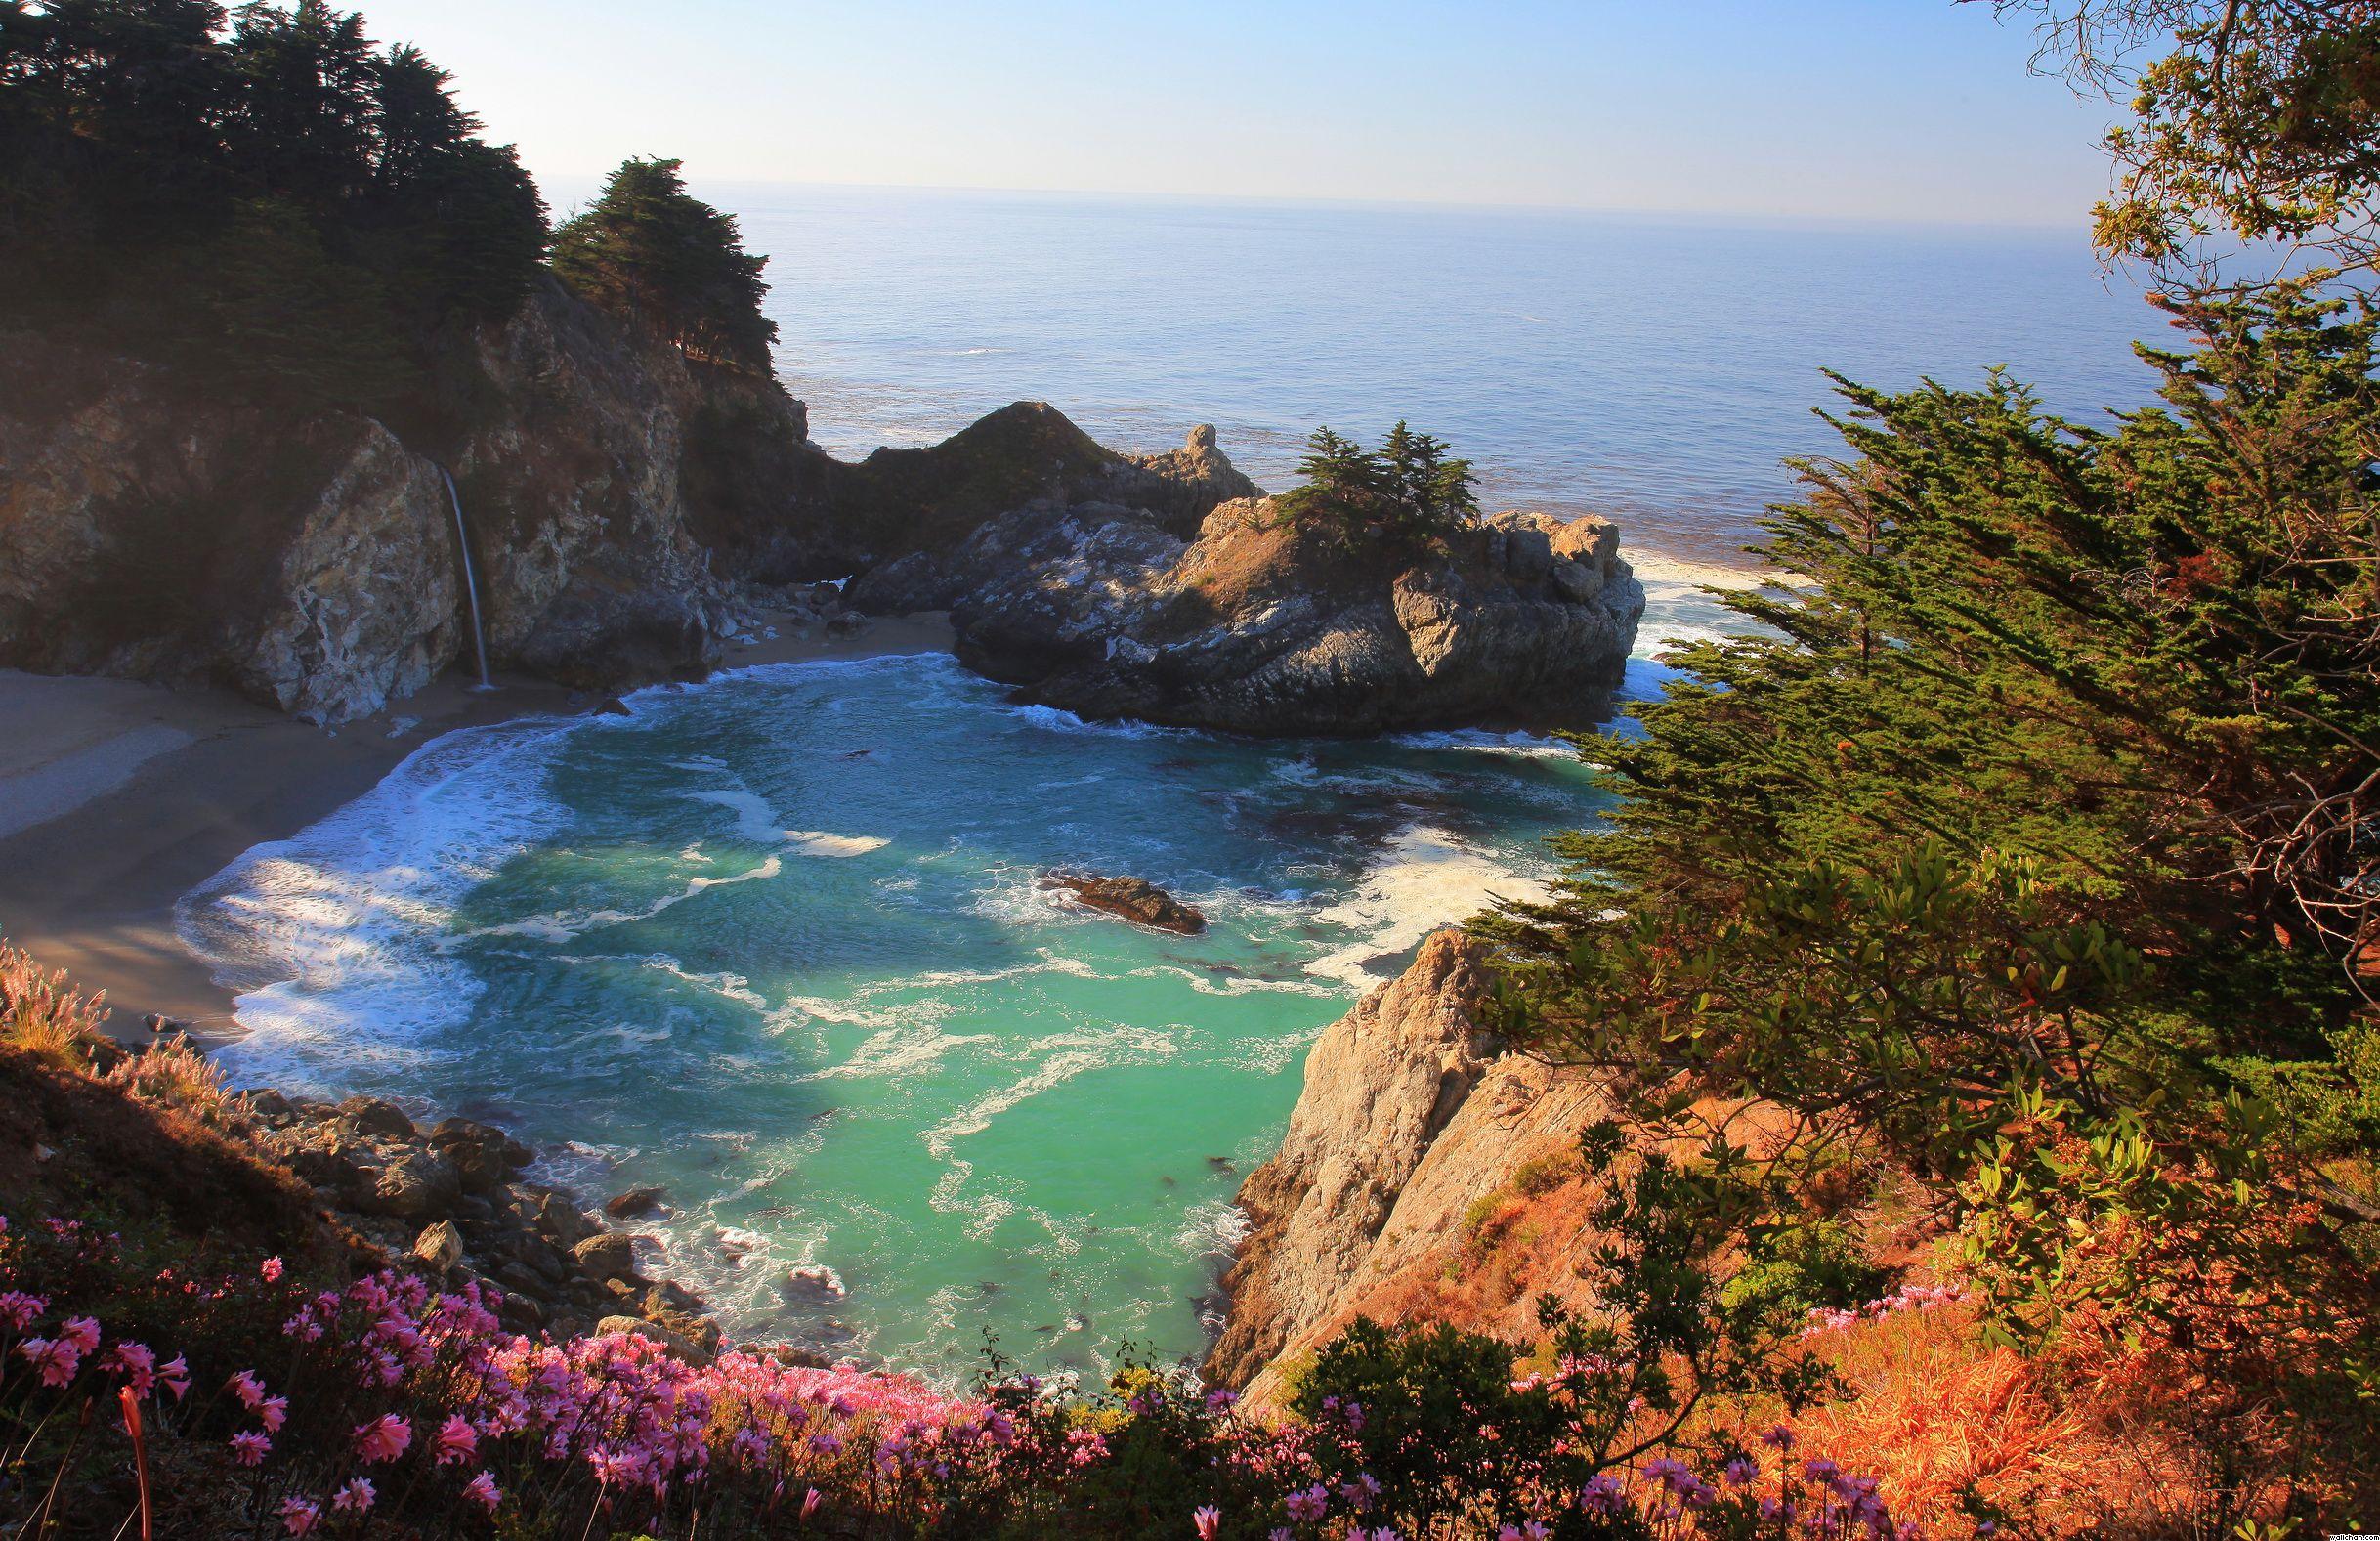 General 2436x1577 beach nature trees sea flowers plants landscape